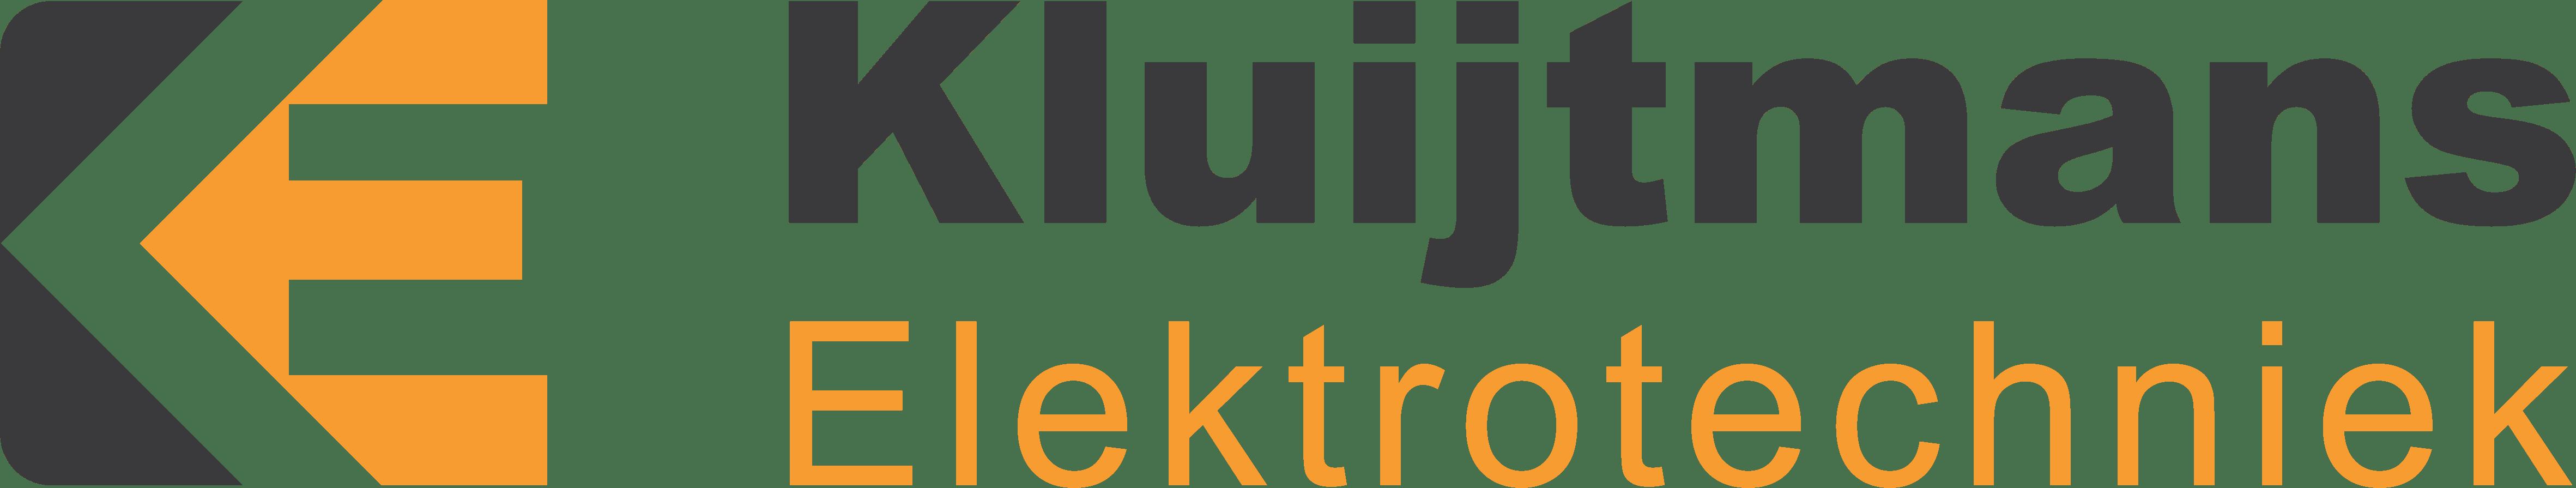 Aelex inlegmontagesysteem